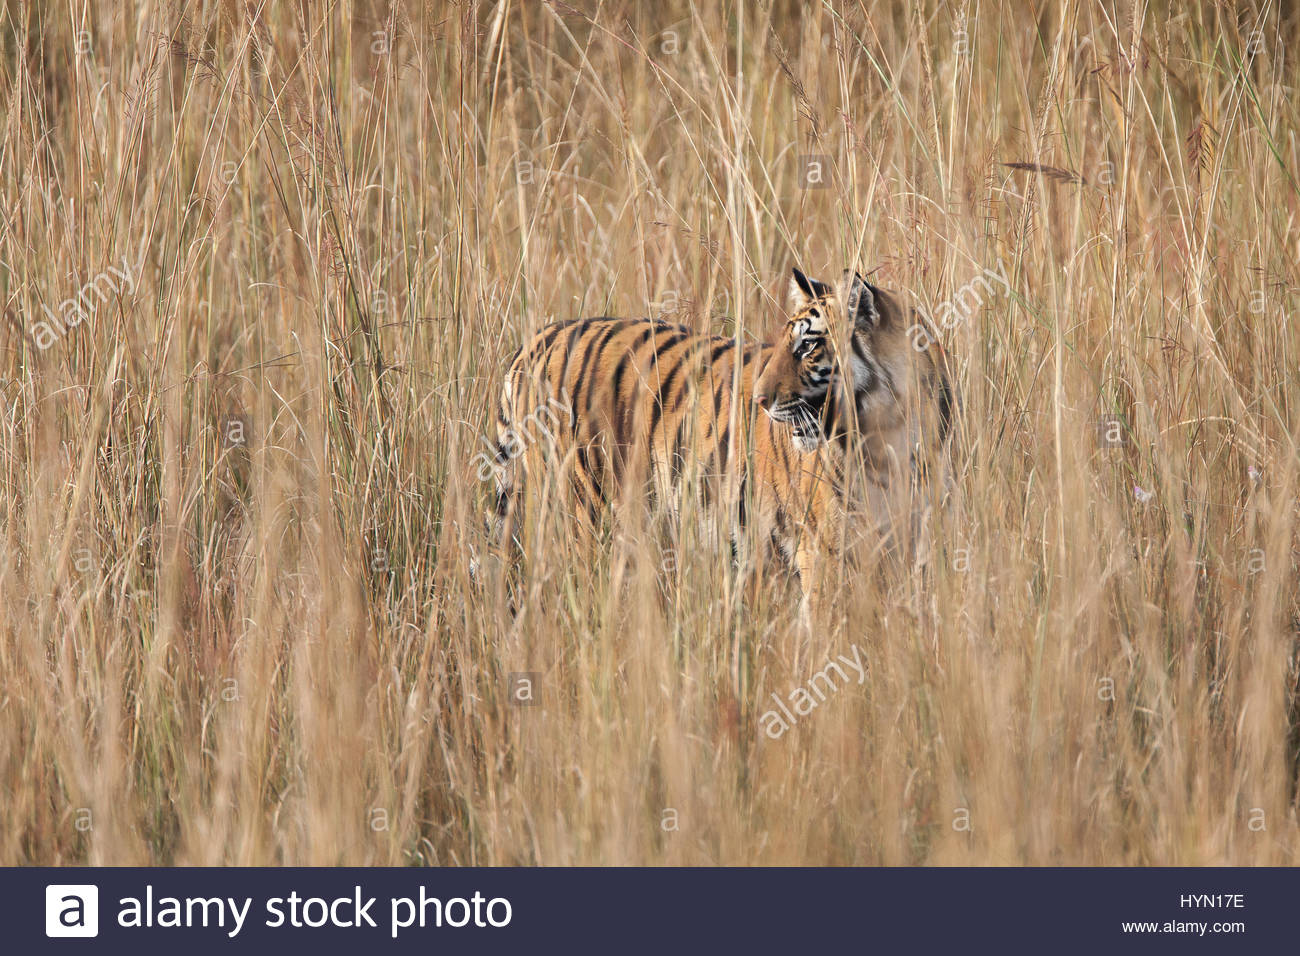 A year-old Bengal tiger, Panthera tigris tigris, standing in tall grass in Bandhavgarh National Park. - Stock Image